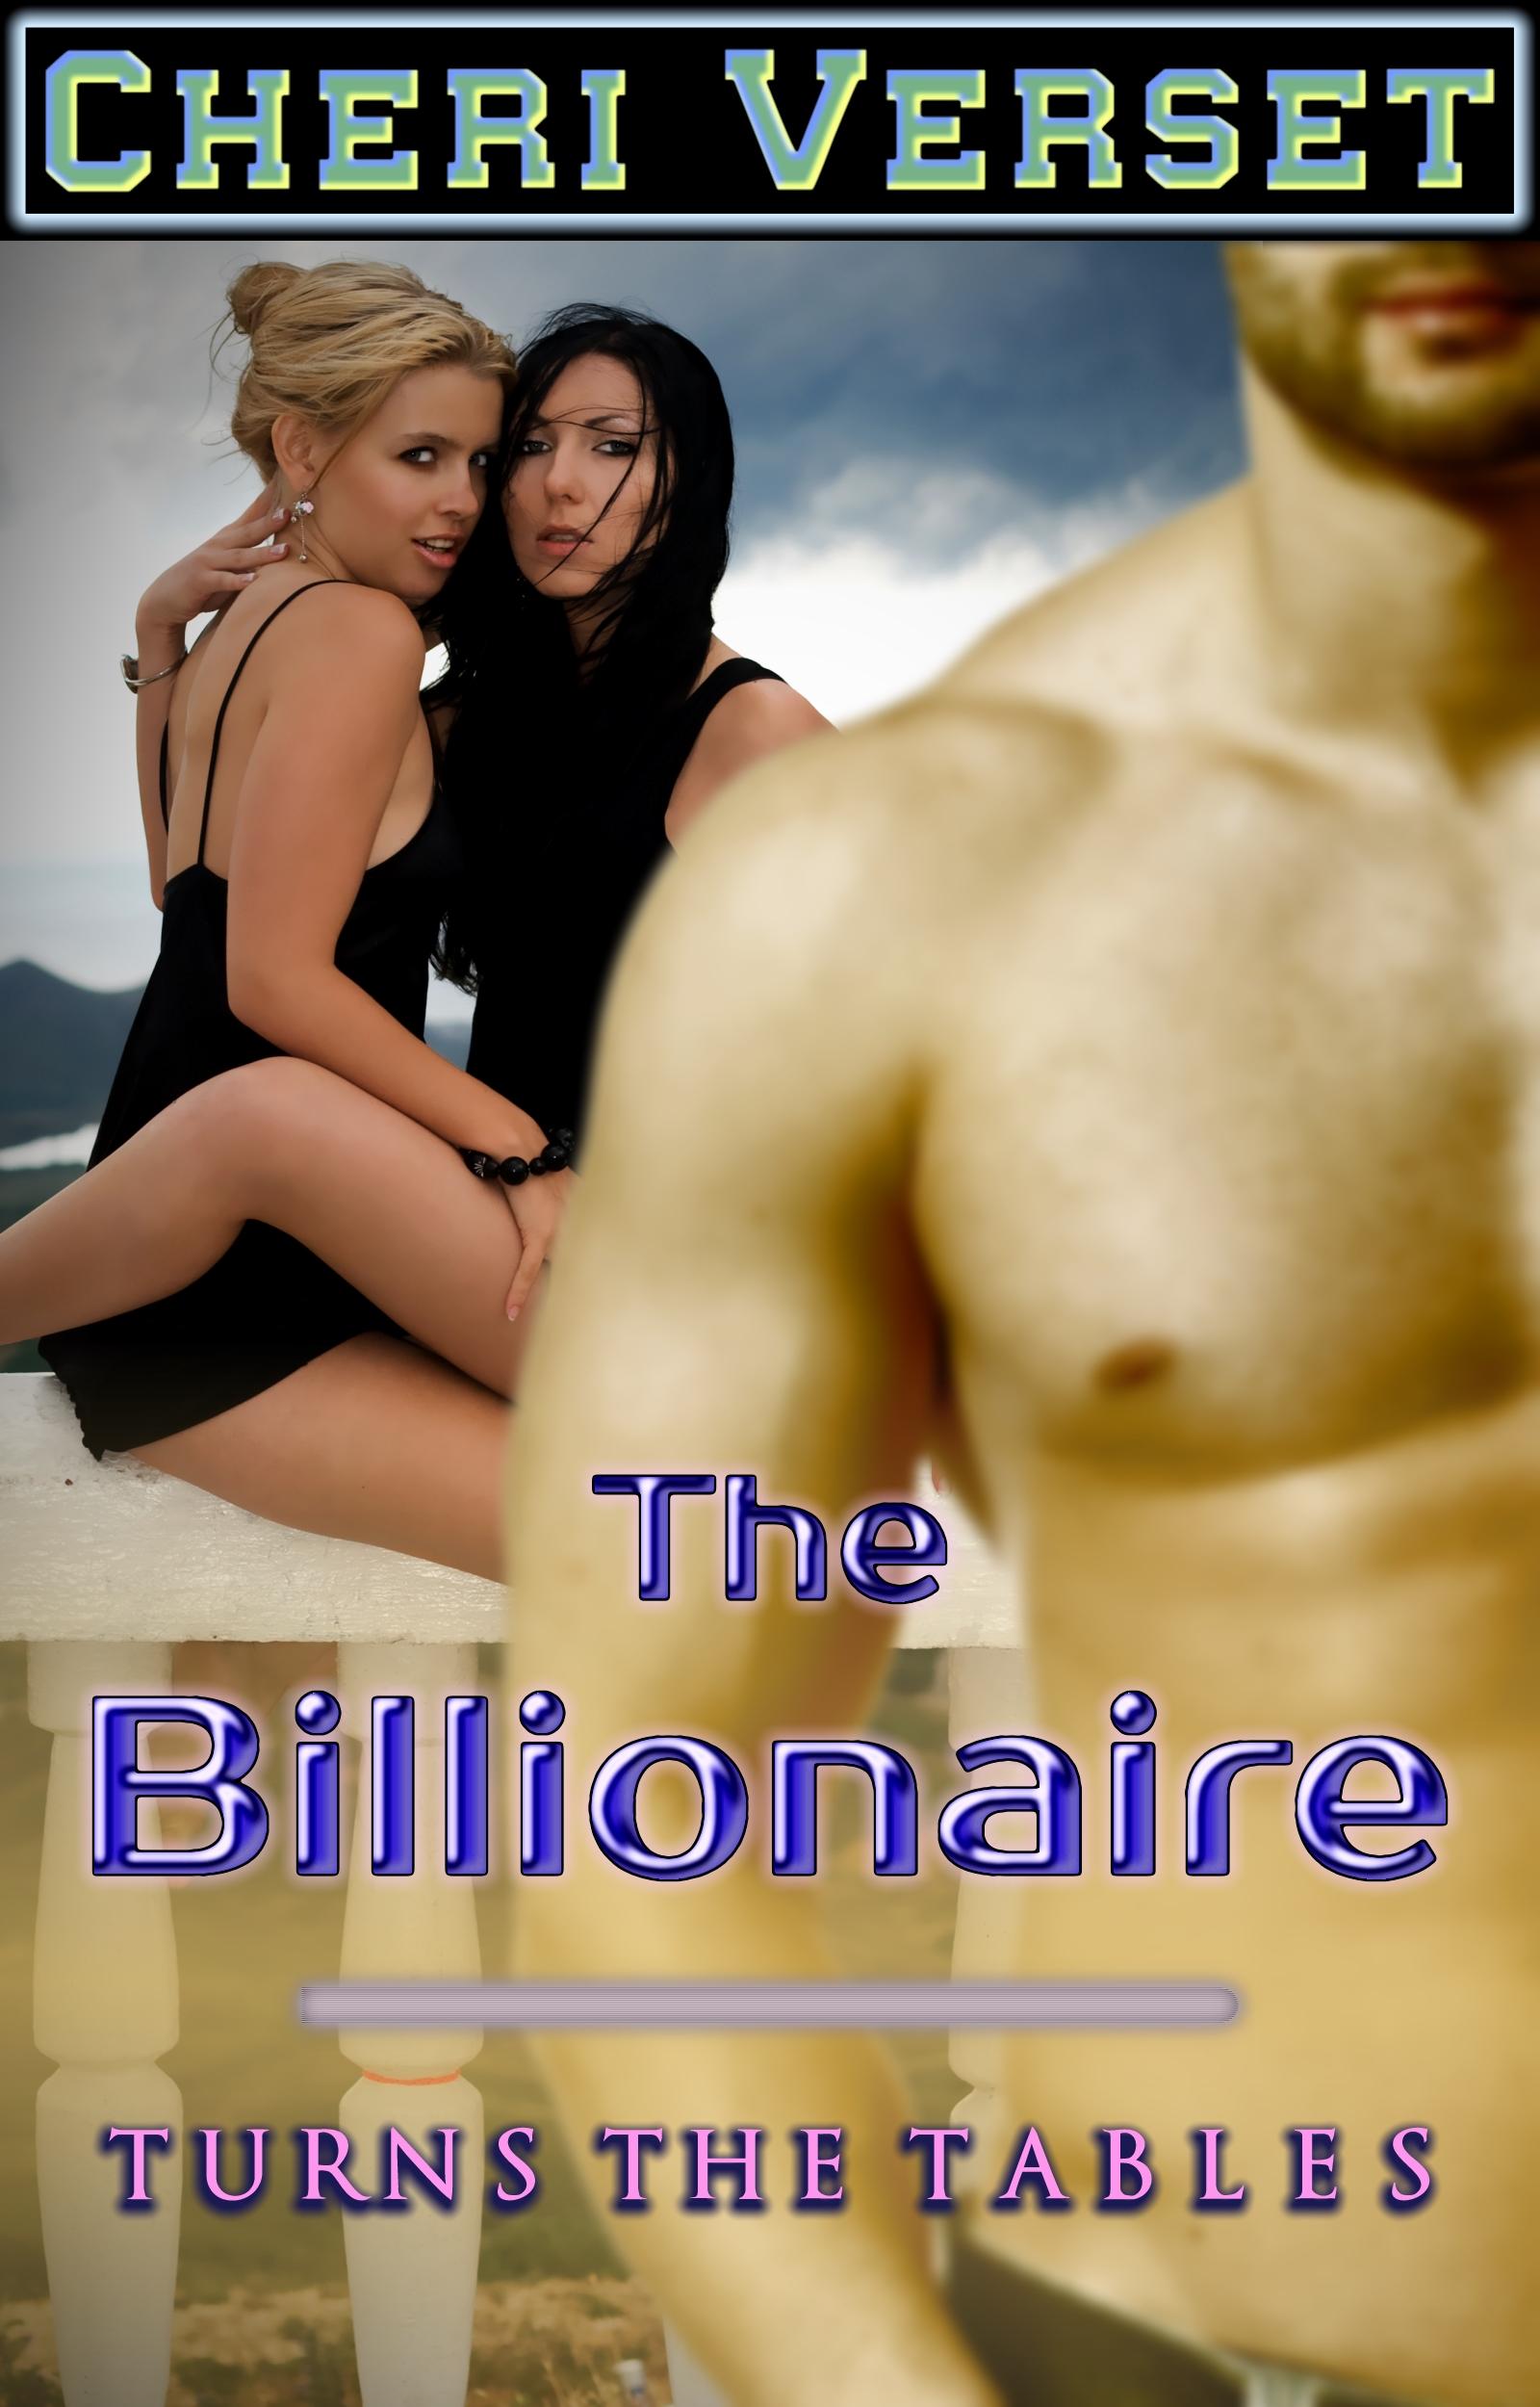 Cheri Verset - The Billionaire Turns the Tables